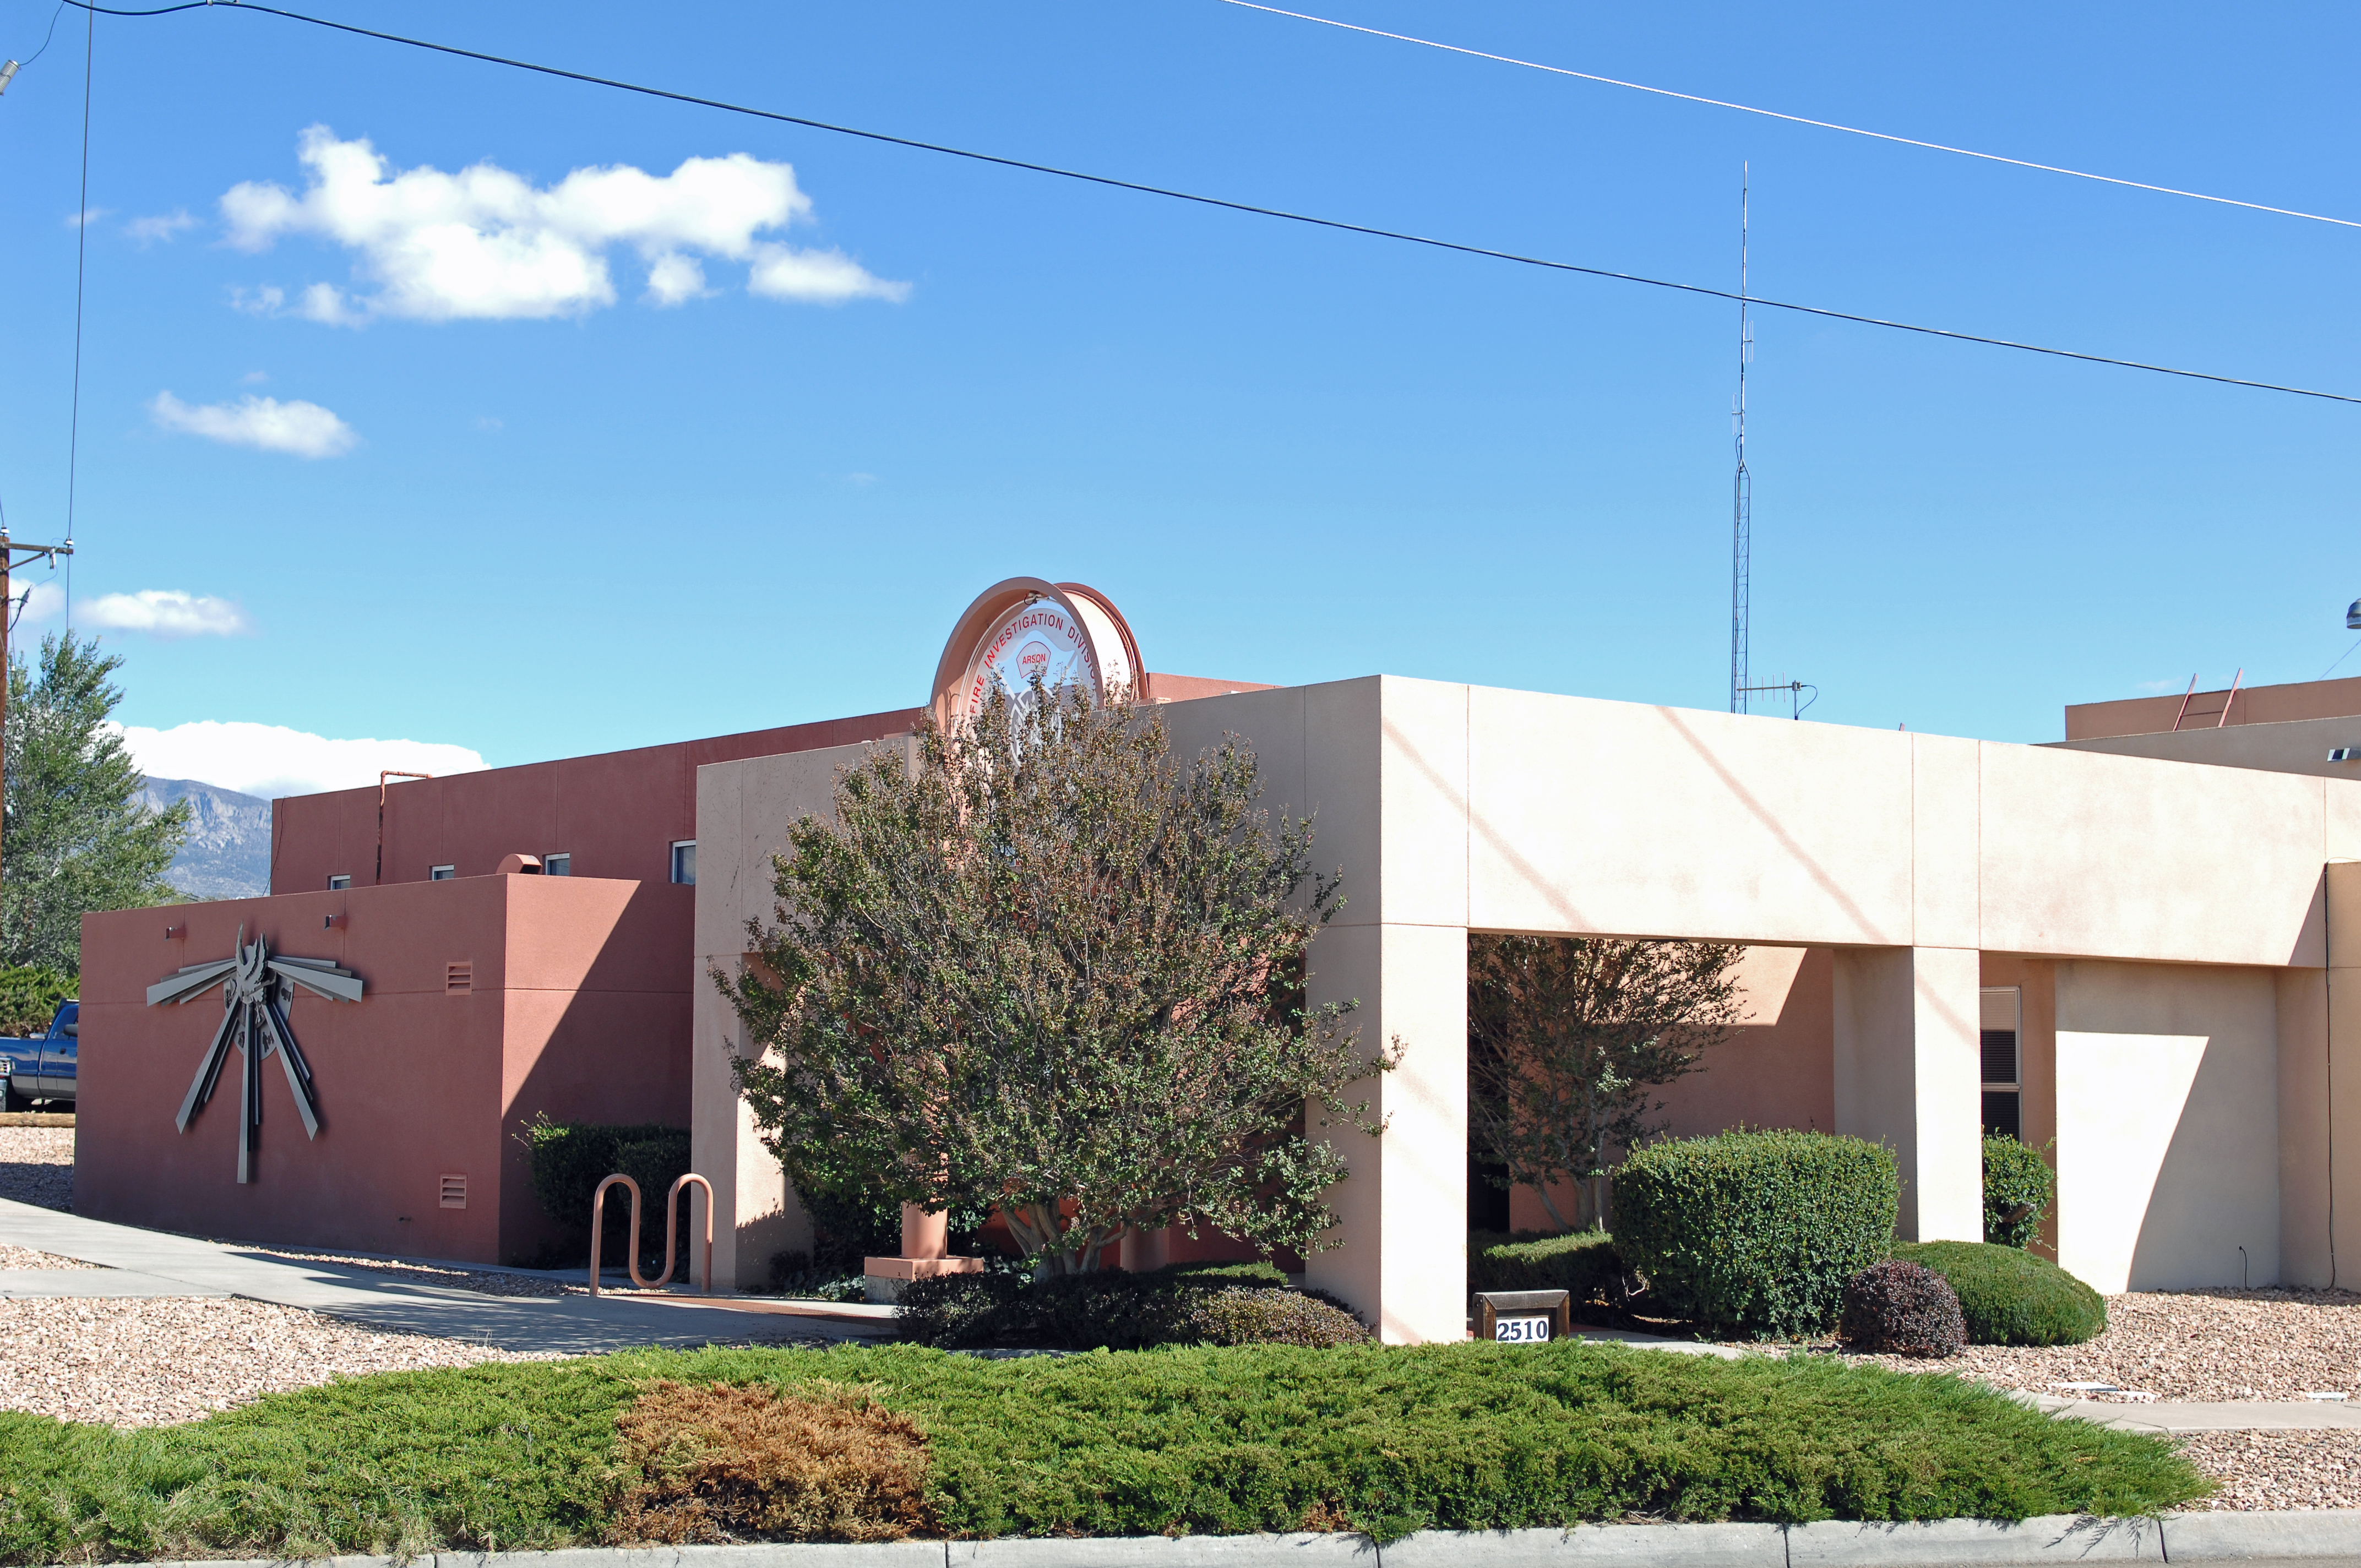 Fire Investigation Building